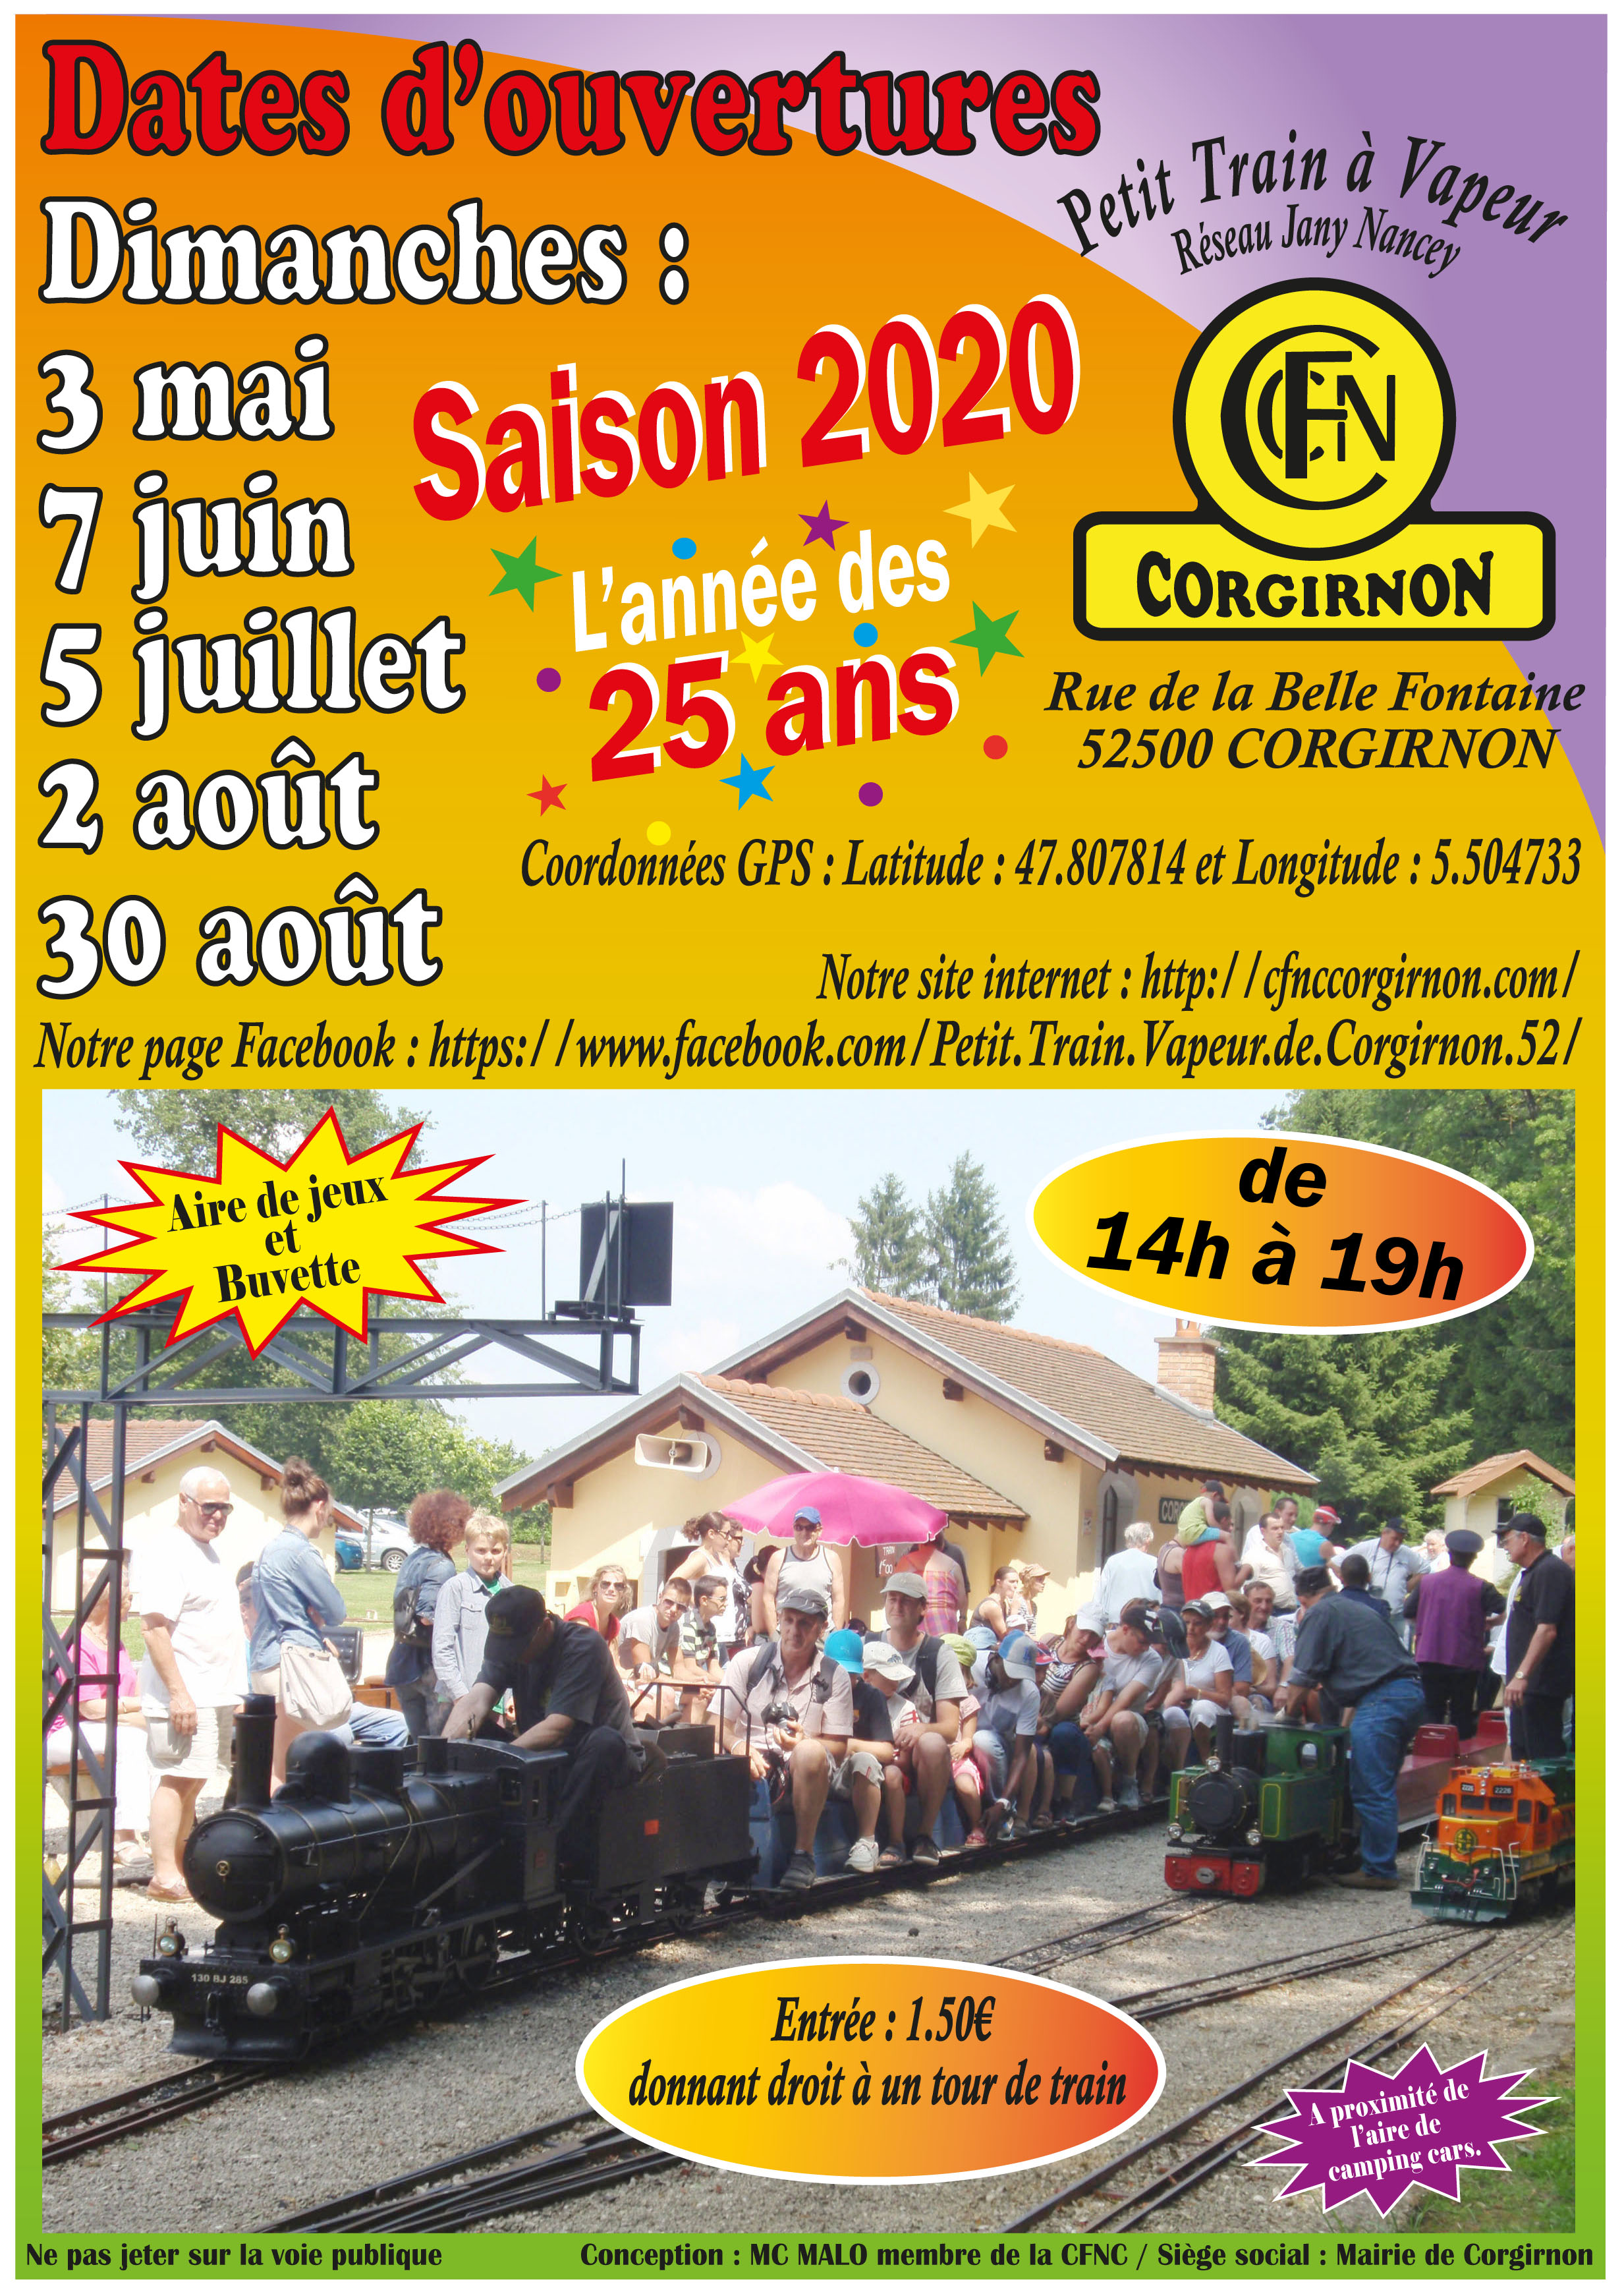 Dates Saison 2020